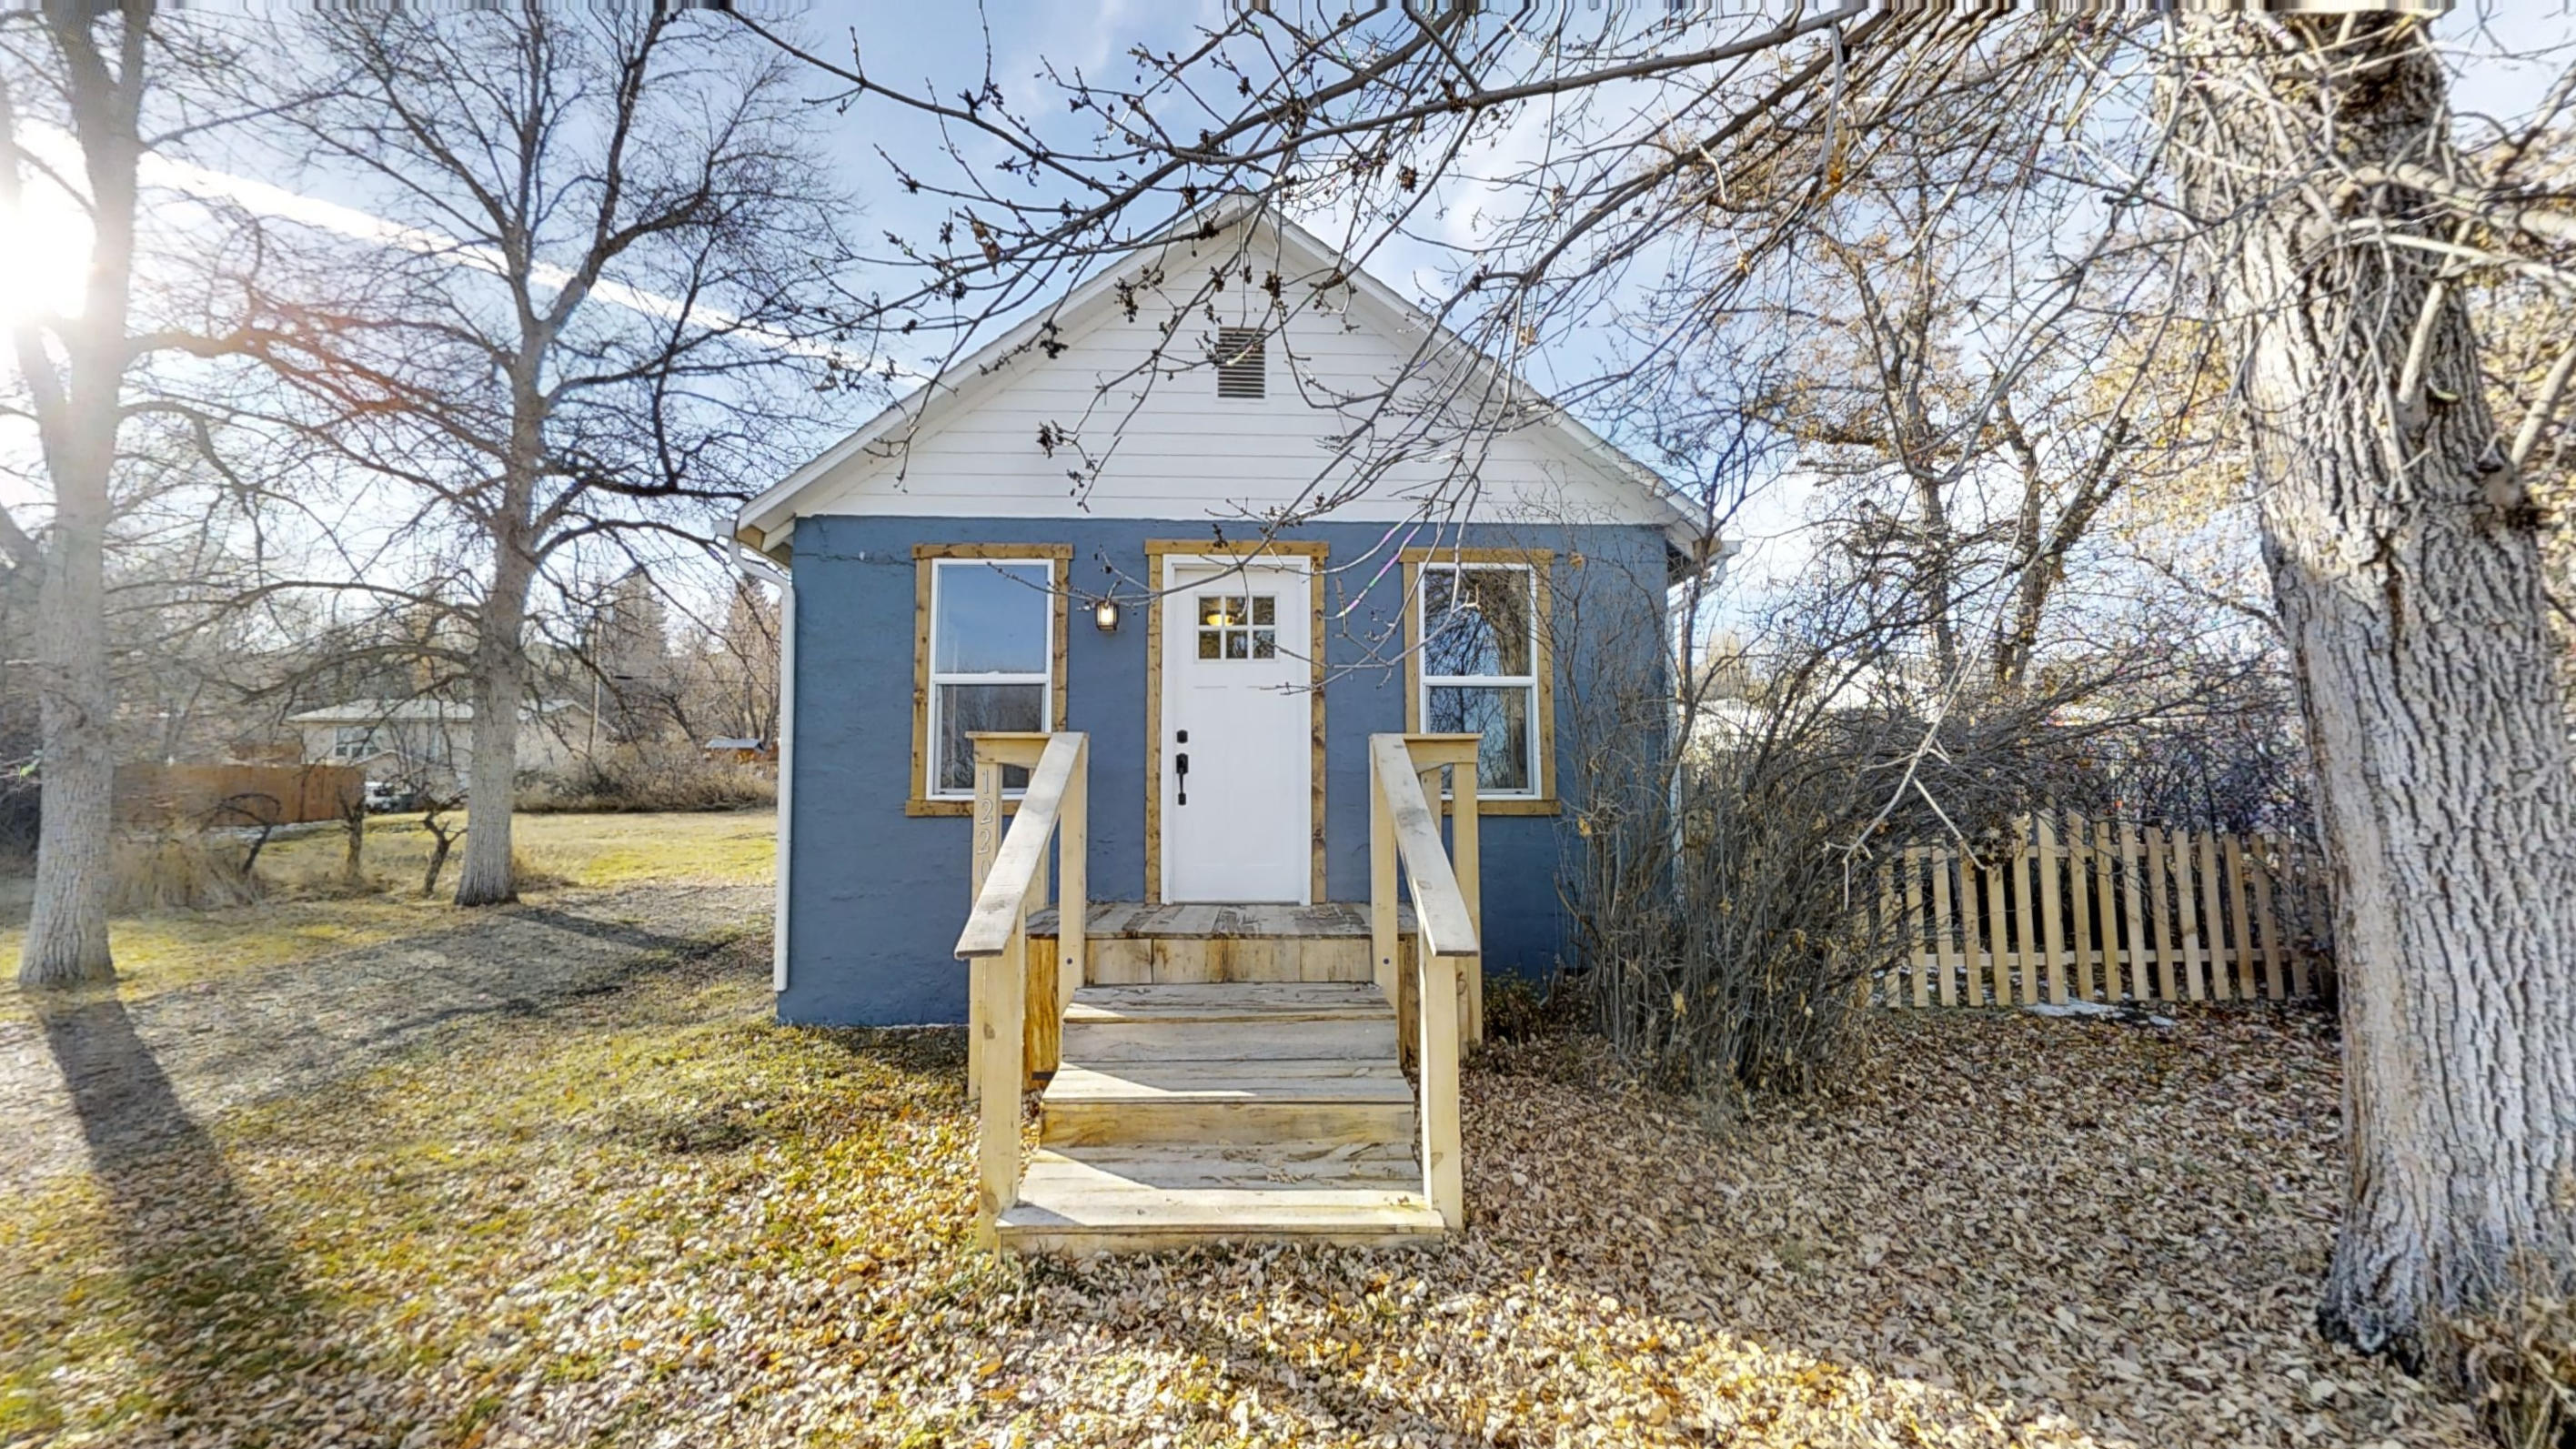 1220 Gladstone Street, Sheridan, Wyoming 82801, 2 Bedrooms Bedrooms, ,1 BathroomBathrooms,Residential,For Sale,Gladstone,18-1187